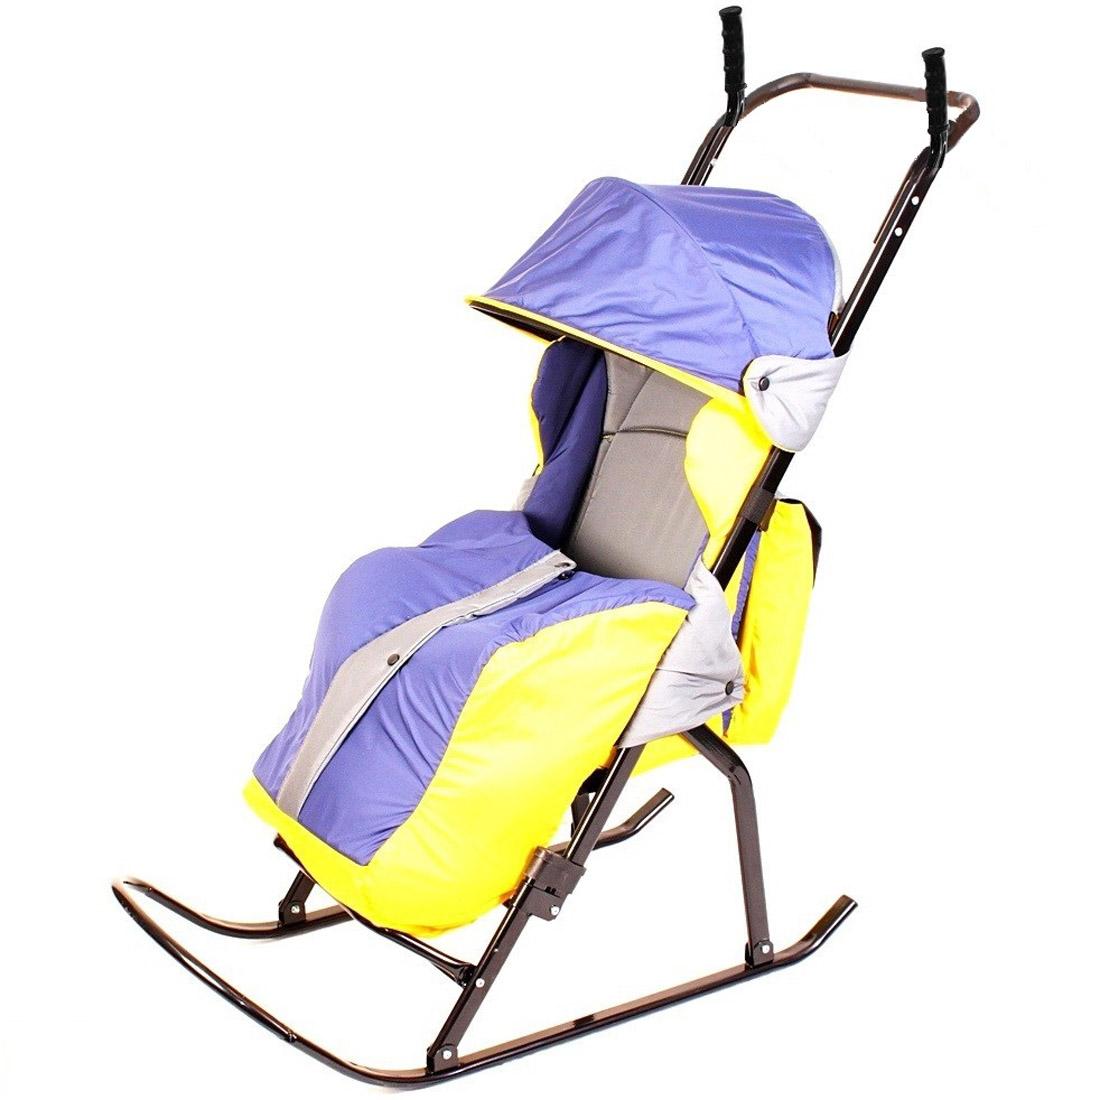 Санки-коляска RT Кенгуру-1 Серые с желтым и синим